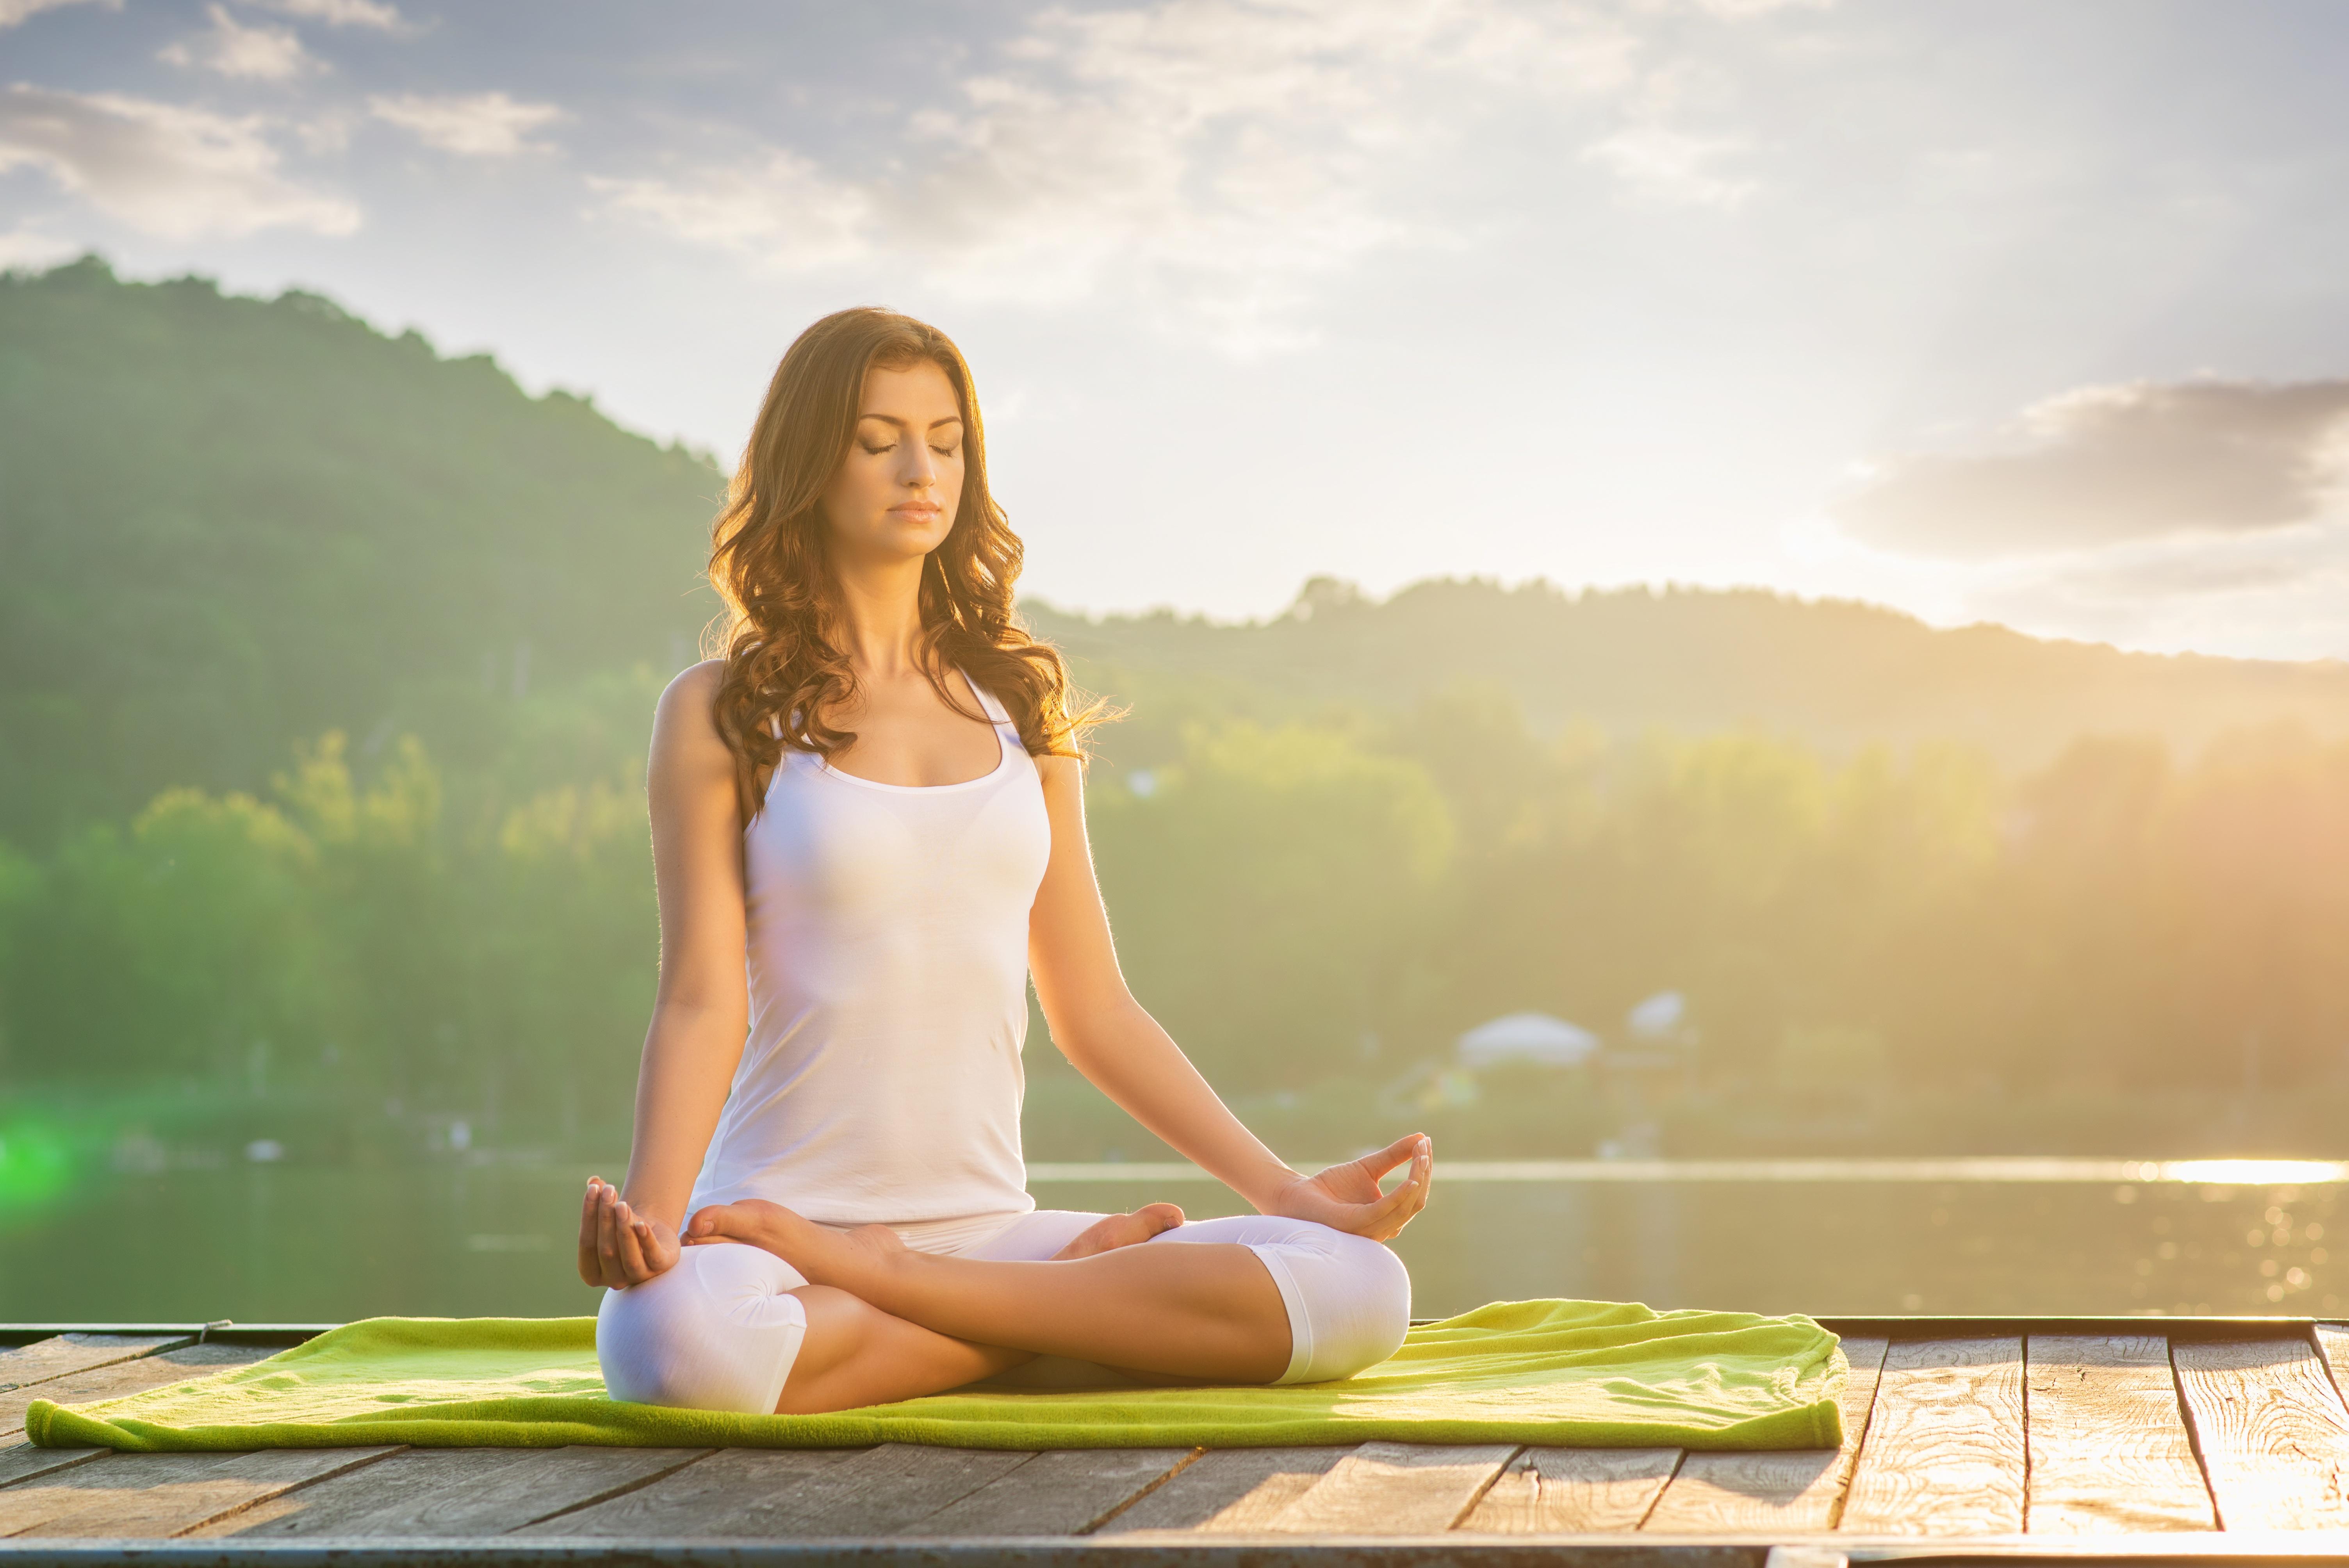 Yoga 5k Retina Ultra Hd Wallpaper Background Image 6016x4016 Id 997550 Wallpaper Abyss